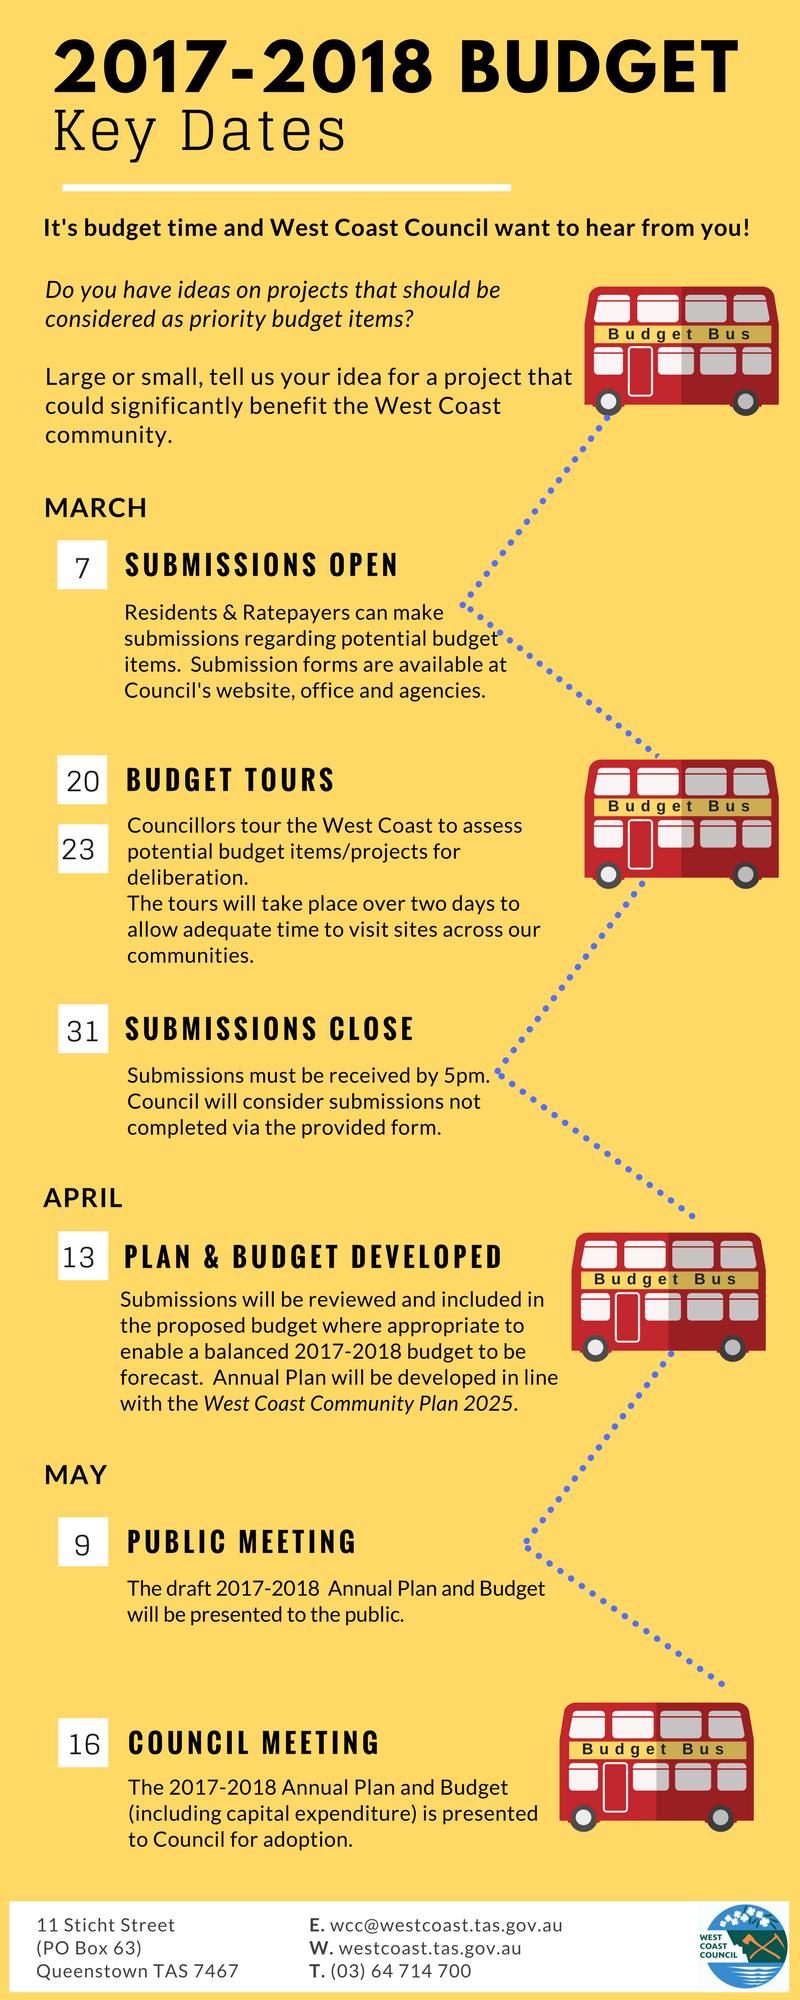 budget key dates